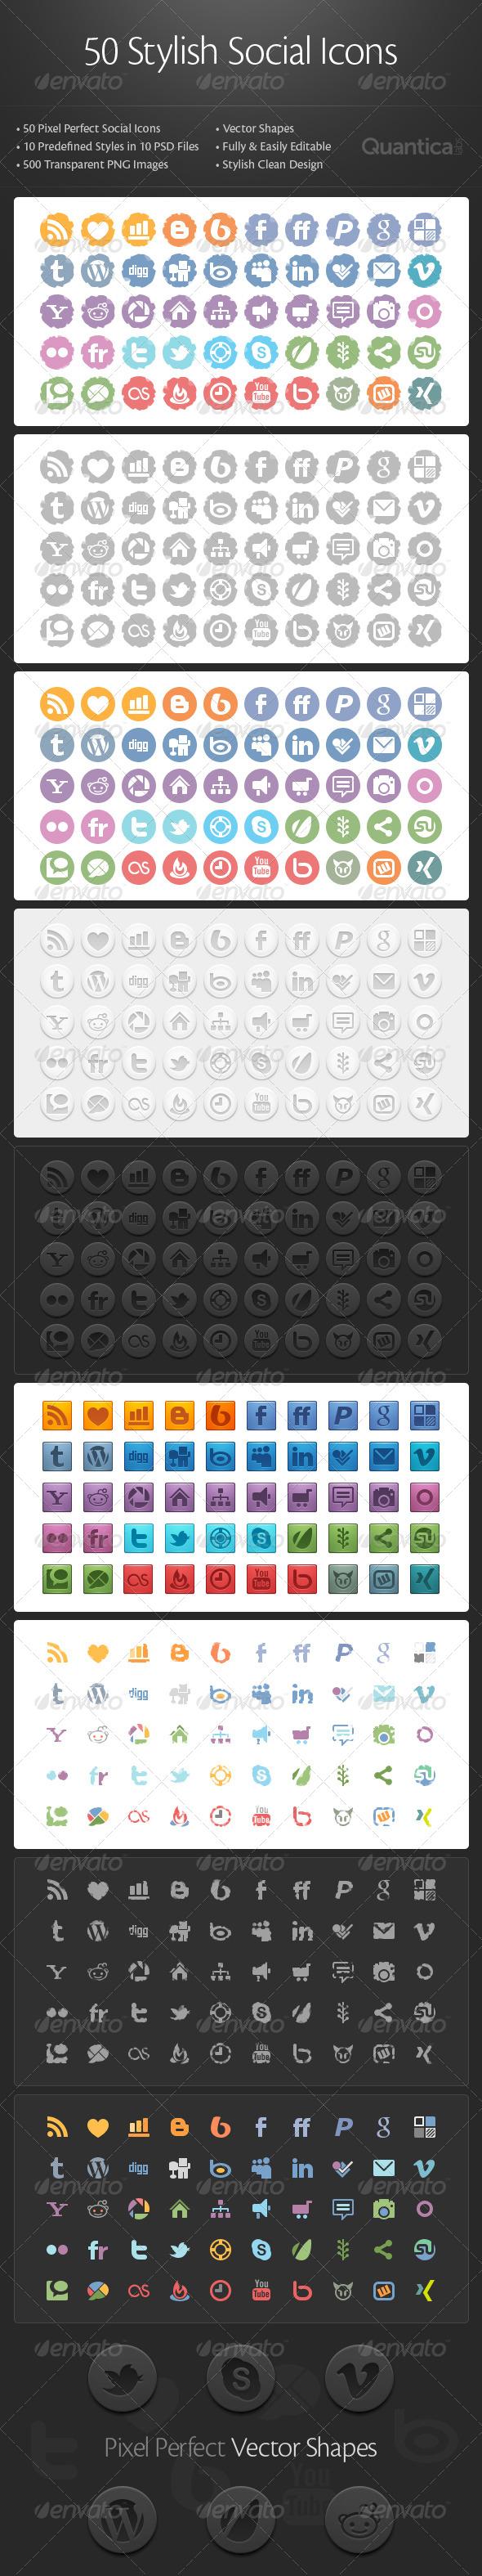 GraphicRiver 50 Stylish Social Icons 238443